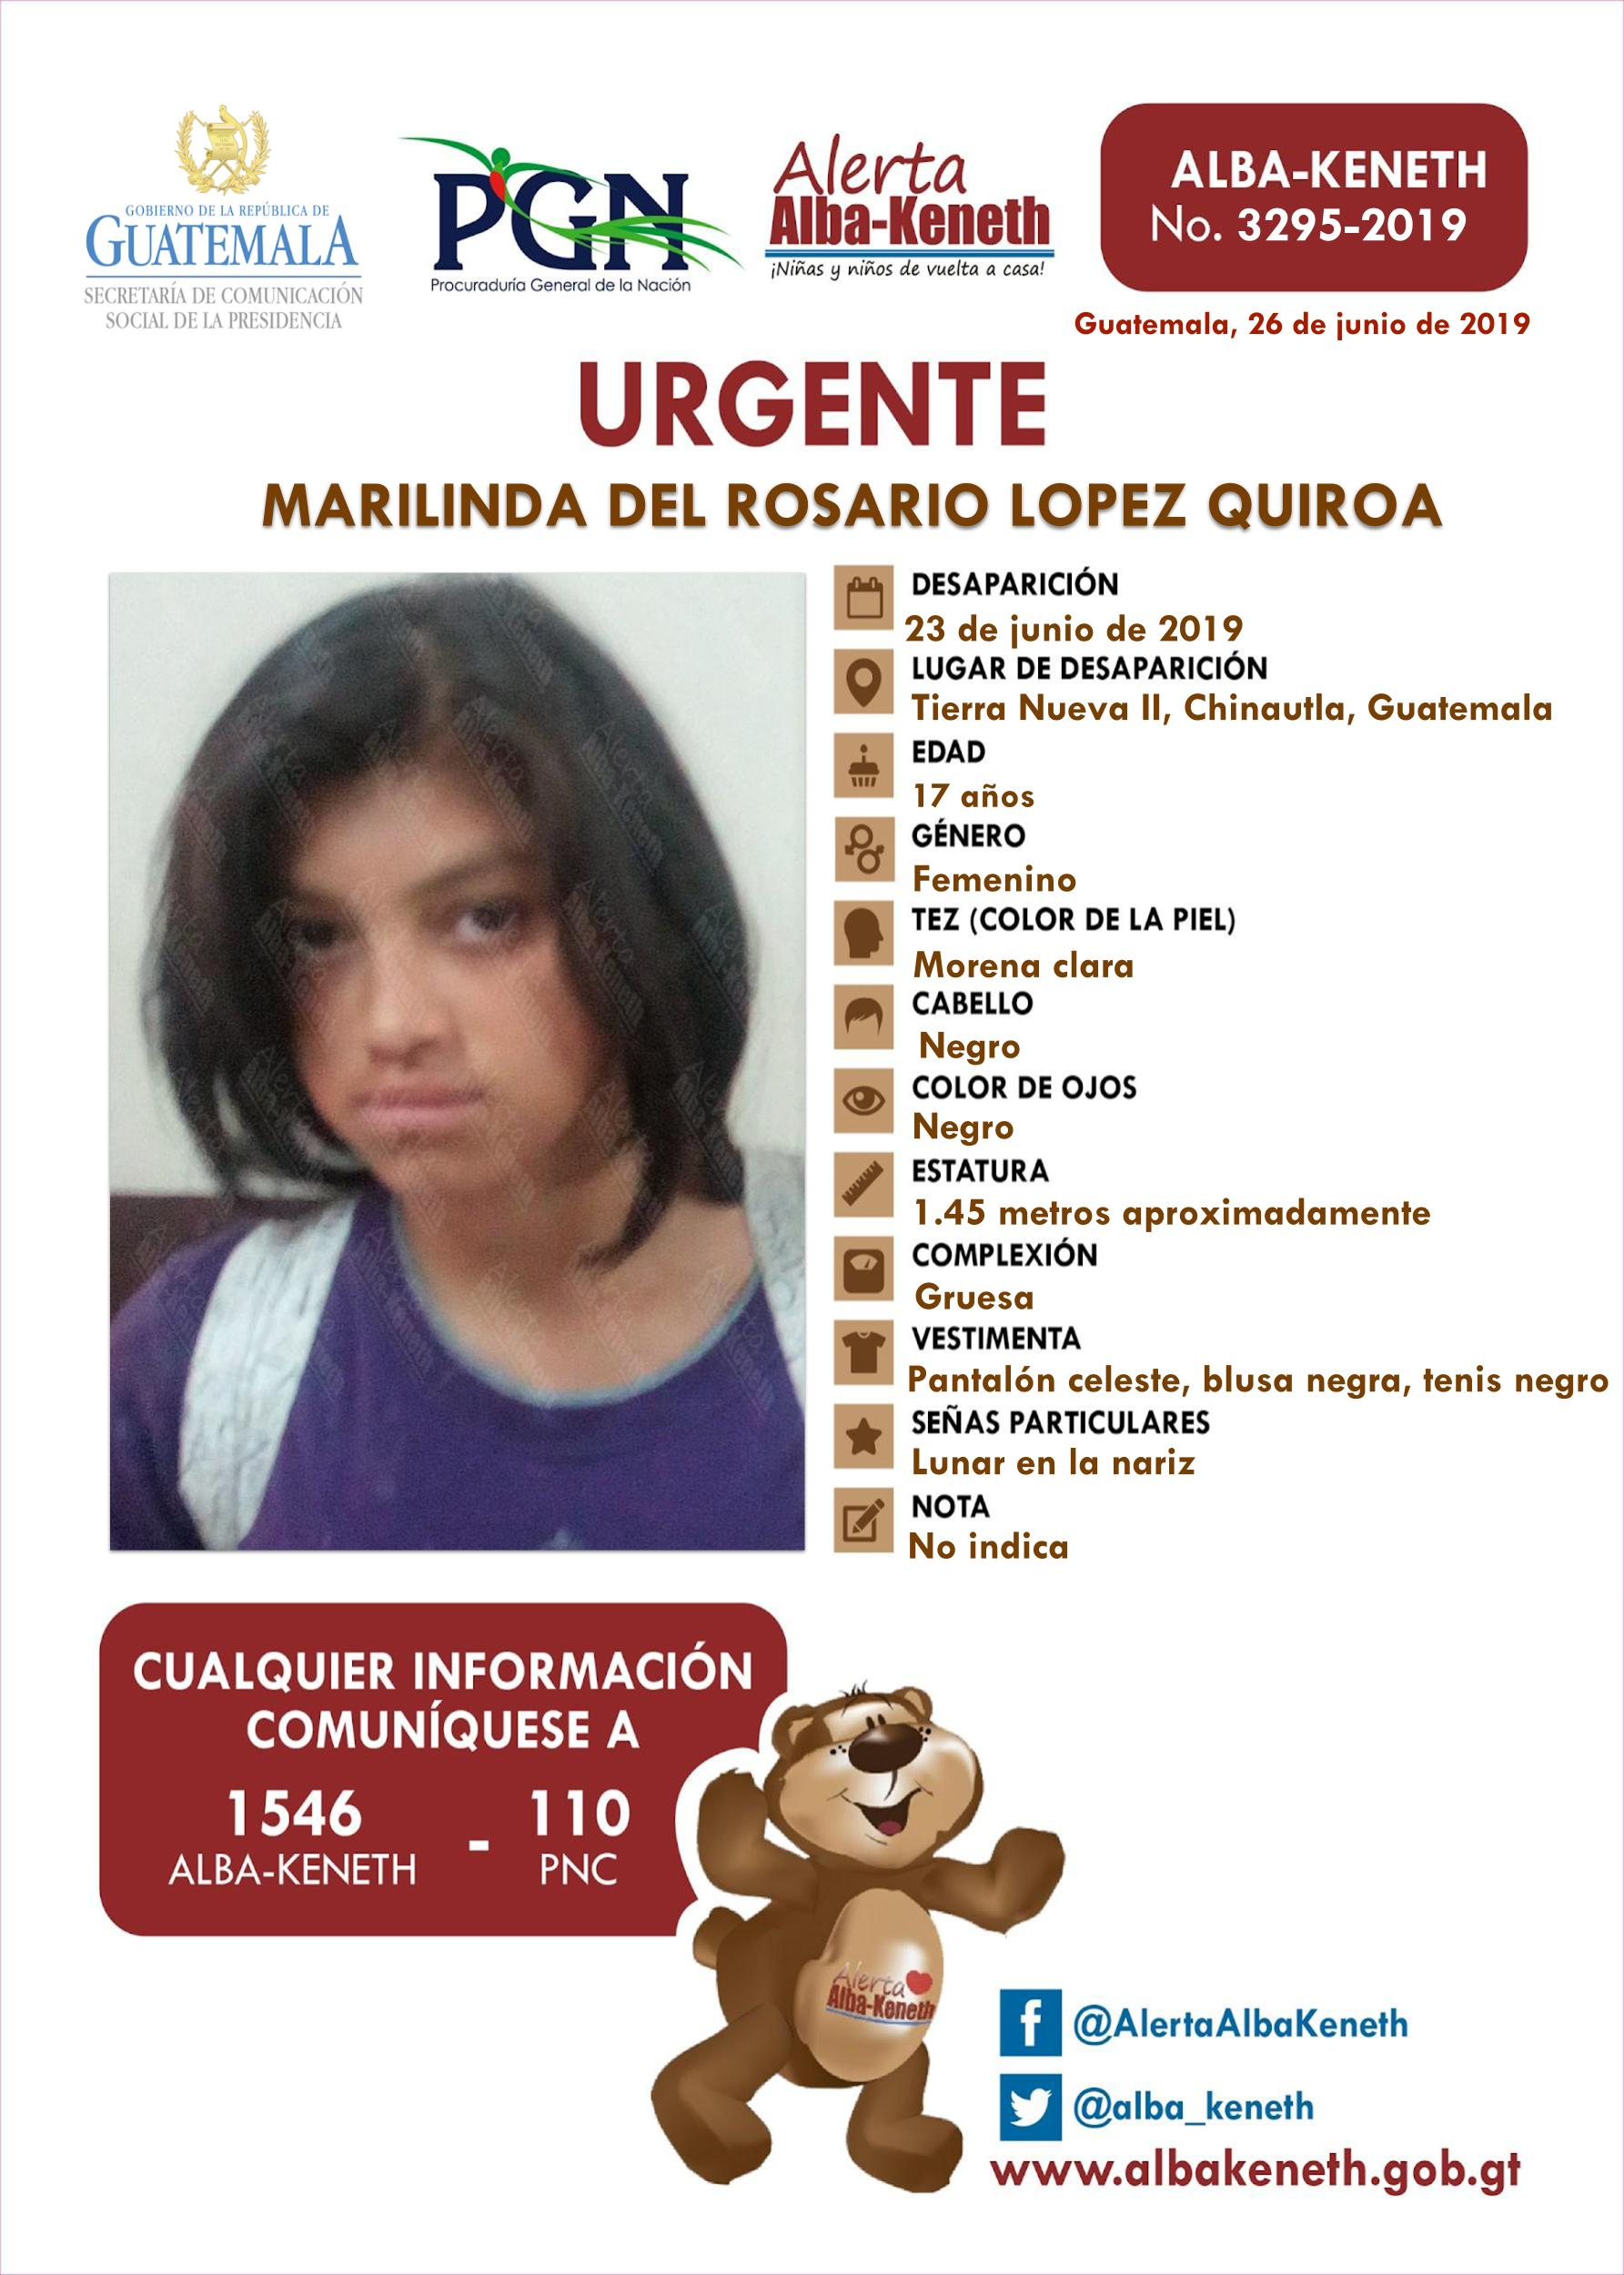 Marilinda del Rosario Lopez Quiroa